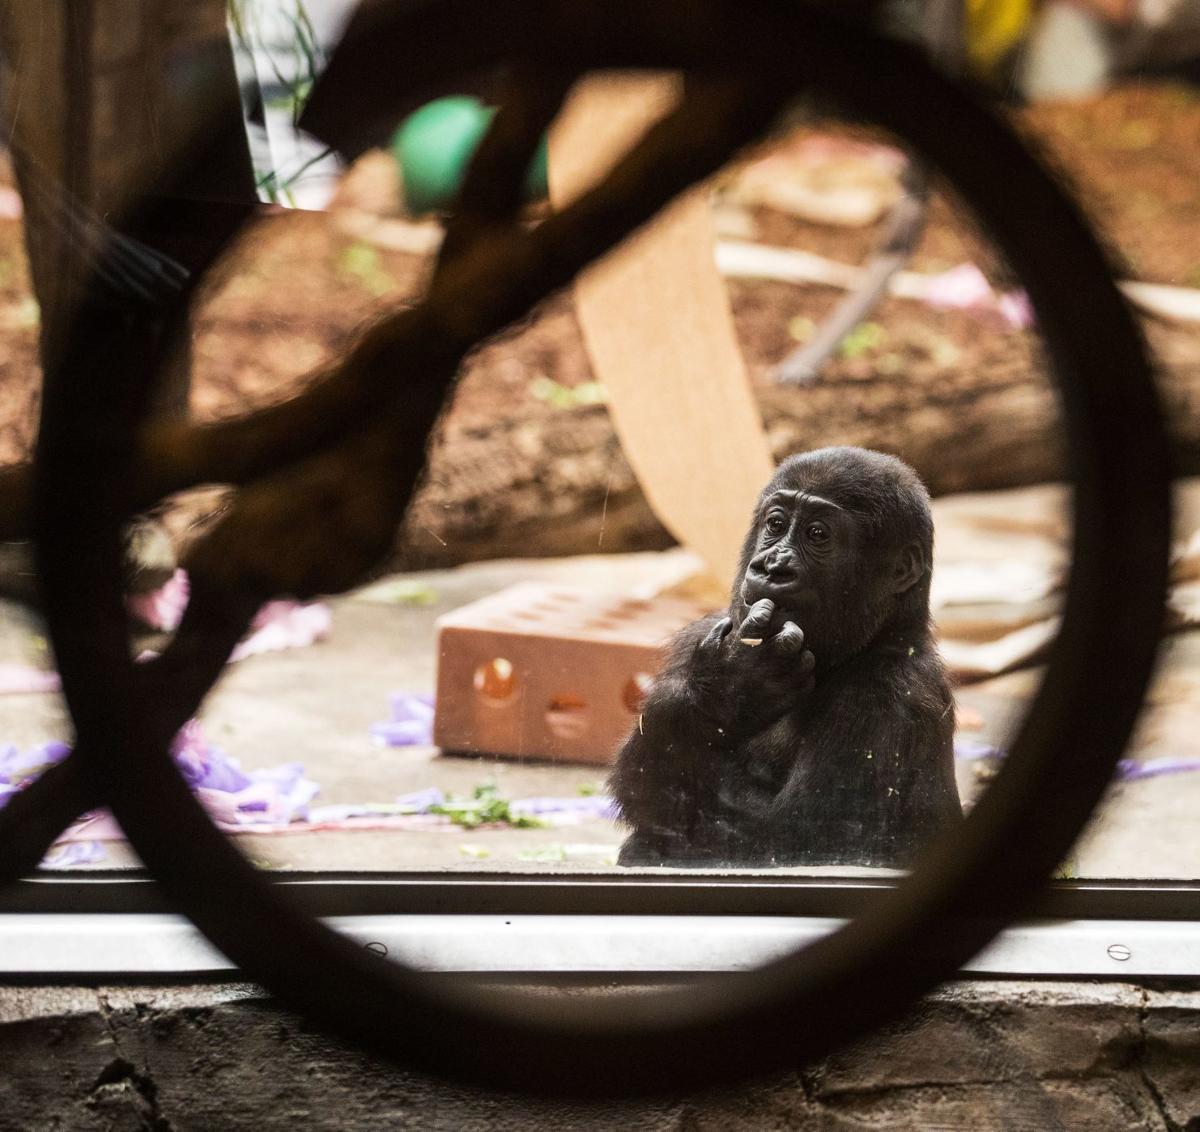 20190601_new_gorilladebut_pic_cm014